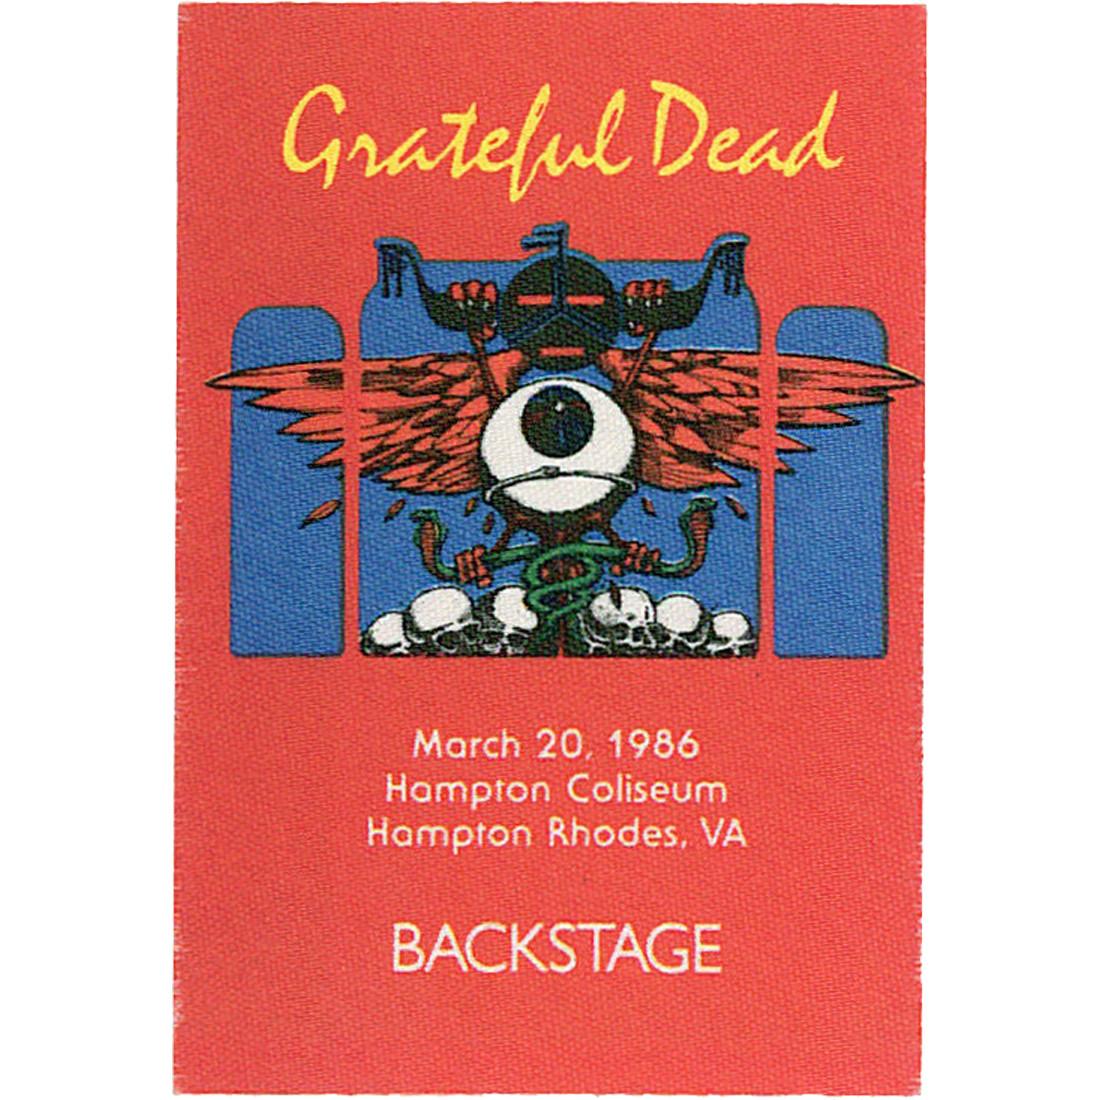 Grateful Dead 1986 03-20 Backstage Pass